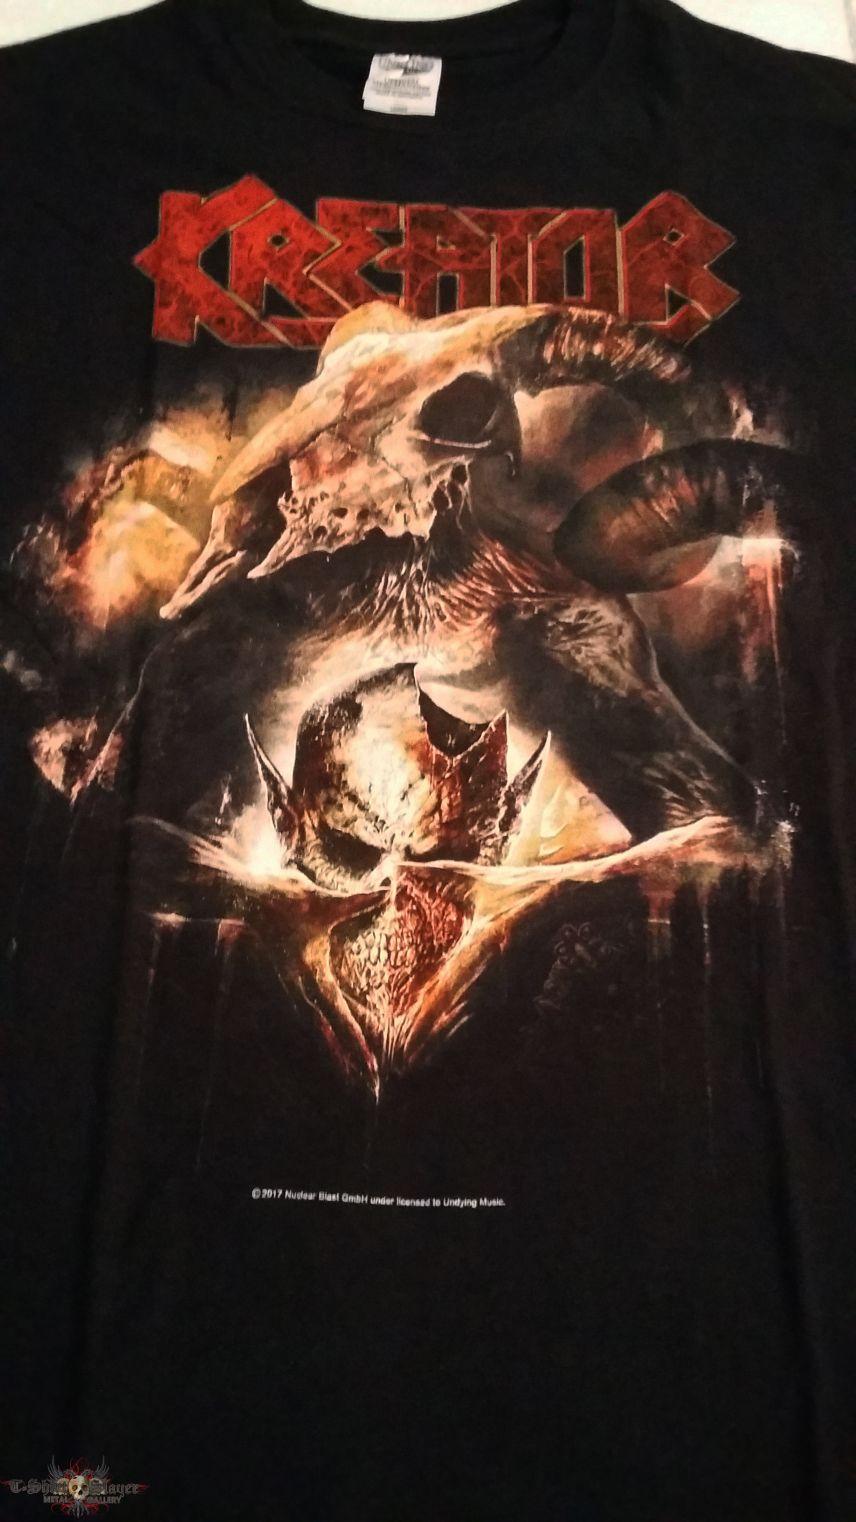 30. Kreator - Gods Of Violence Long Sleeve